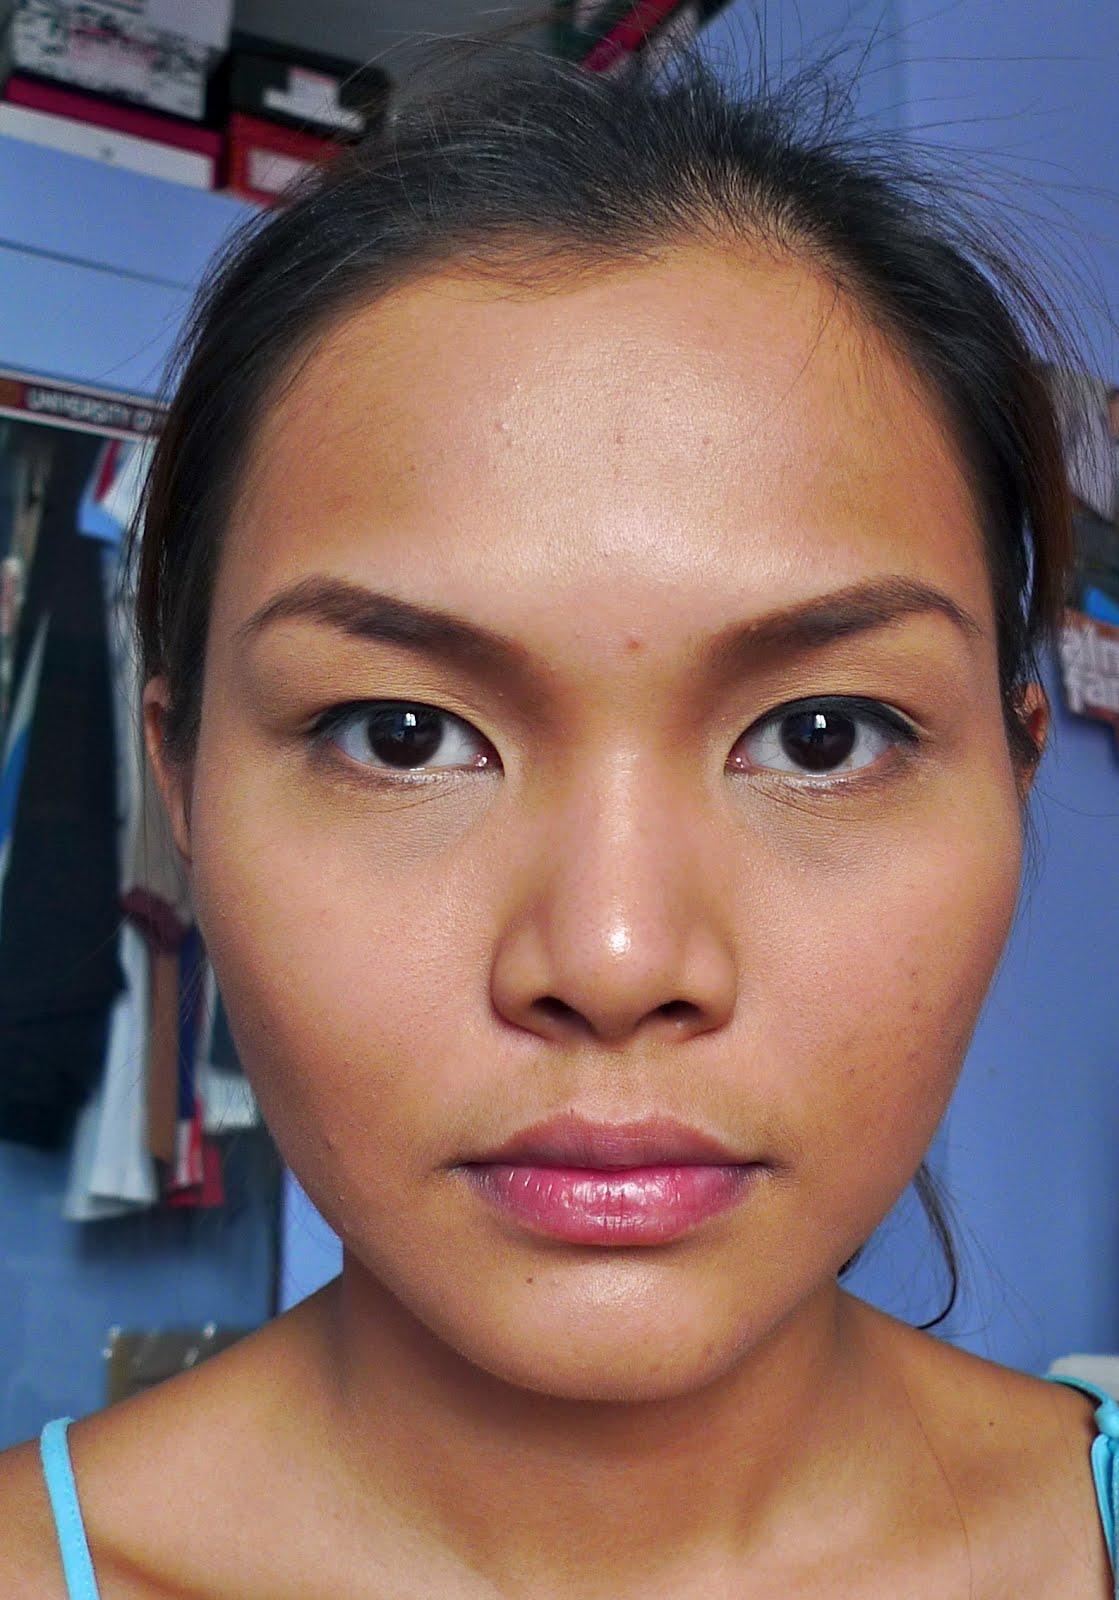 HOW TO: Basic Facial Contouring